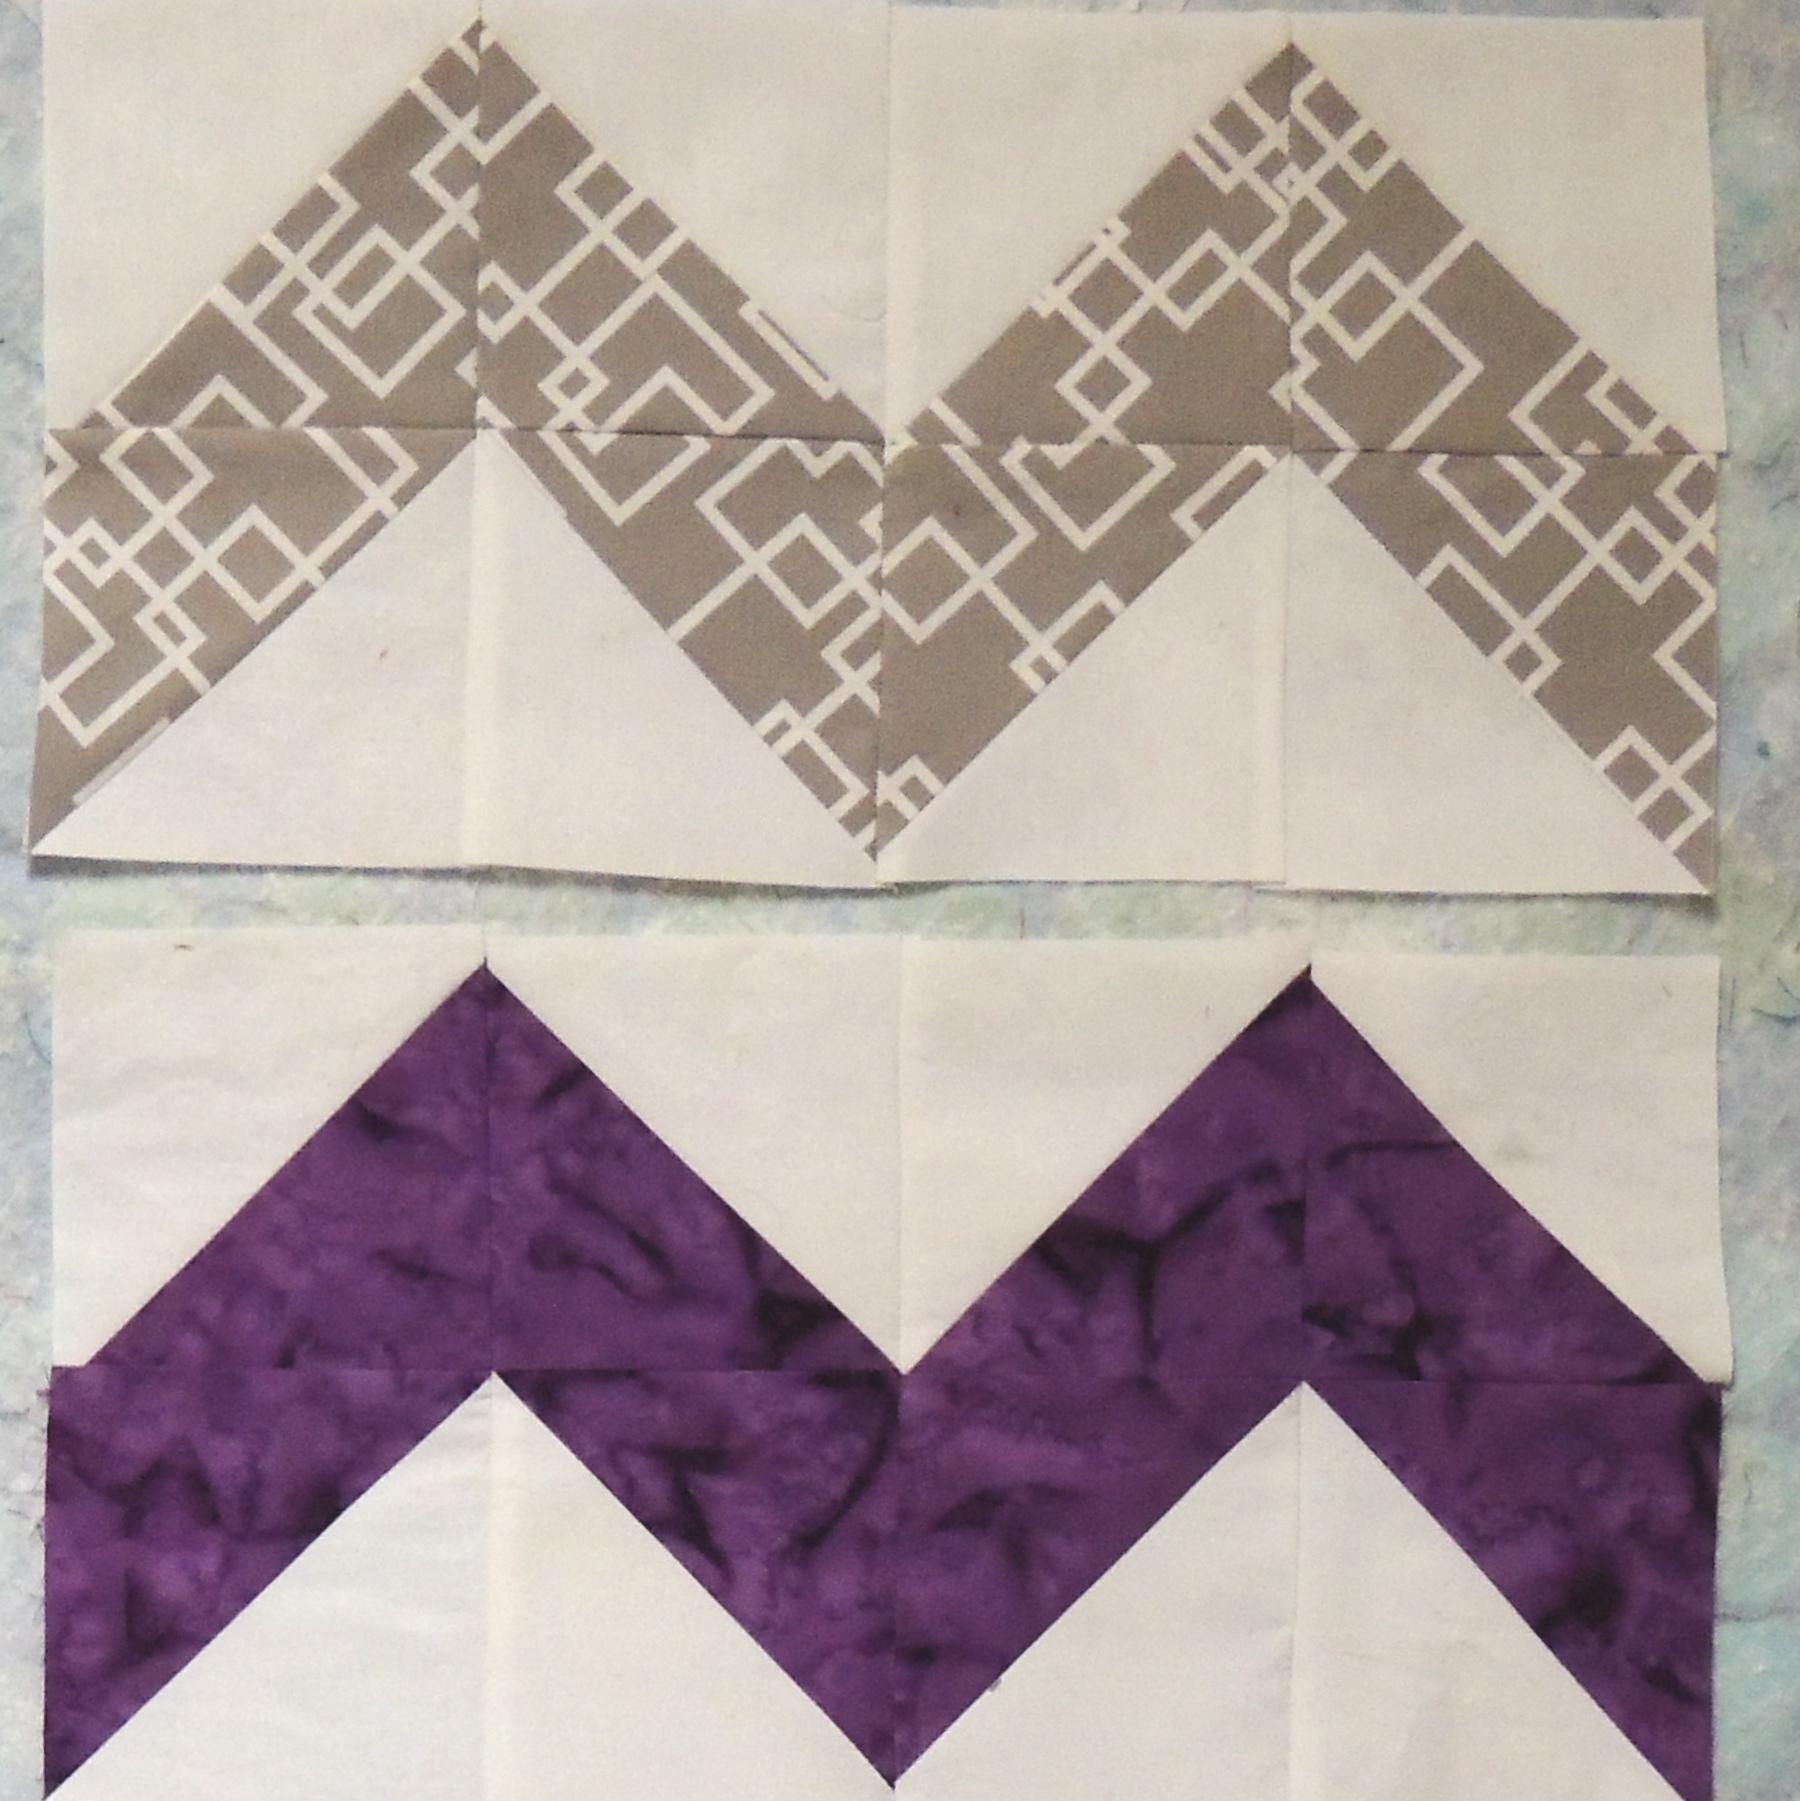 free quilt block patterns sophie junction: Free Quilt Block Patterns free quilt block patterns